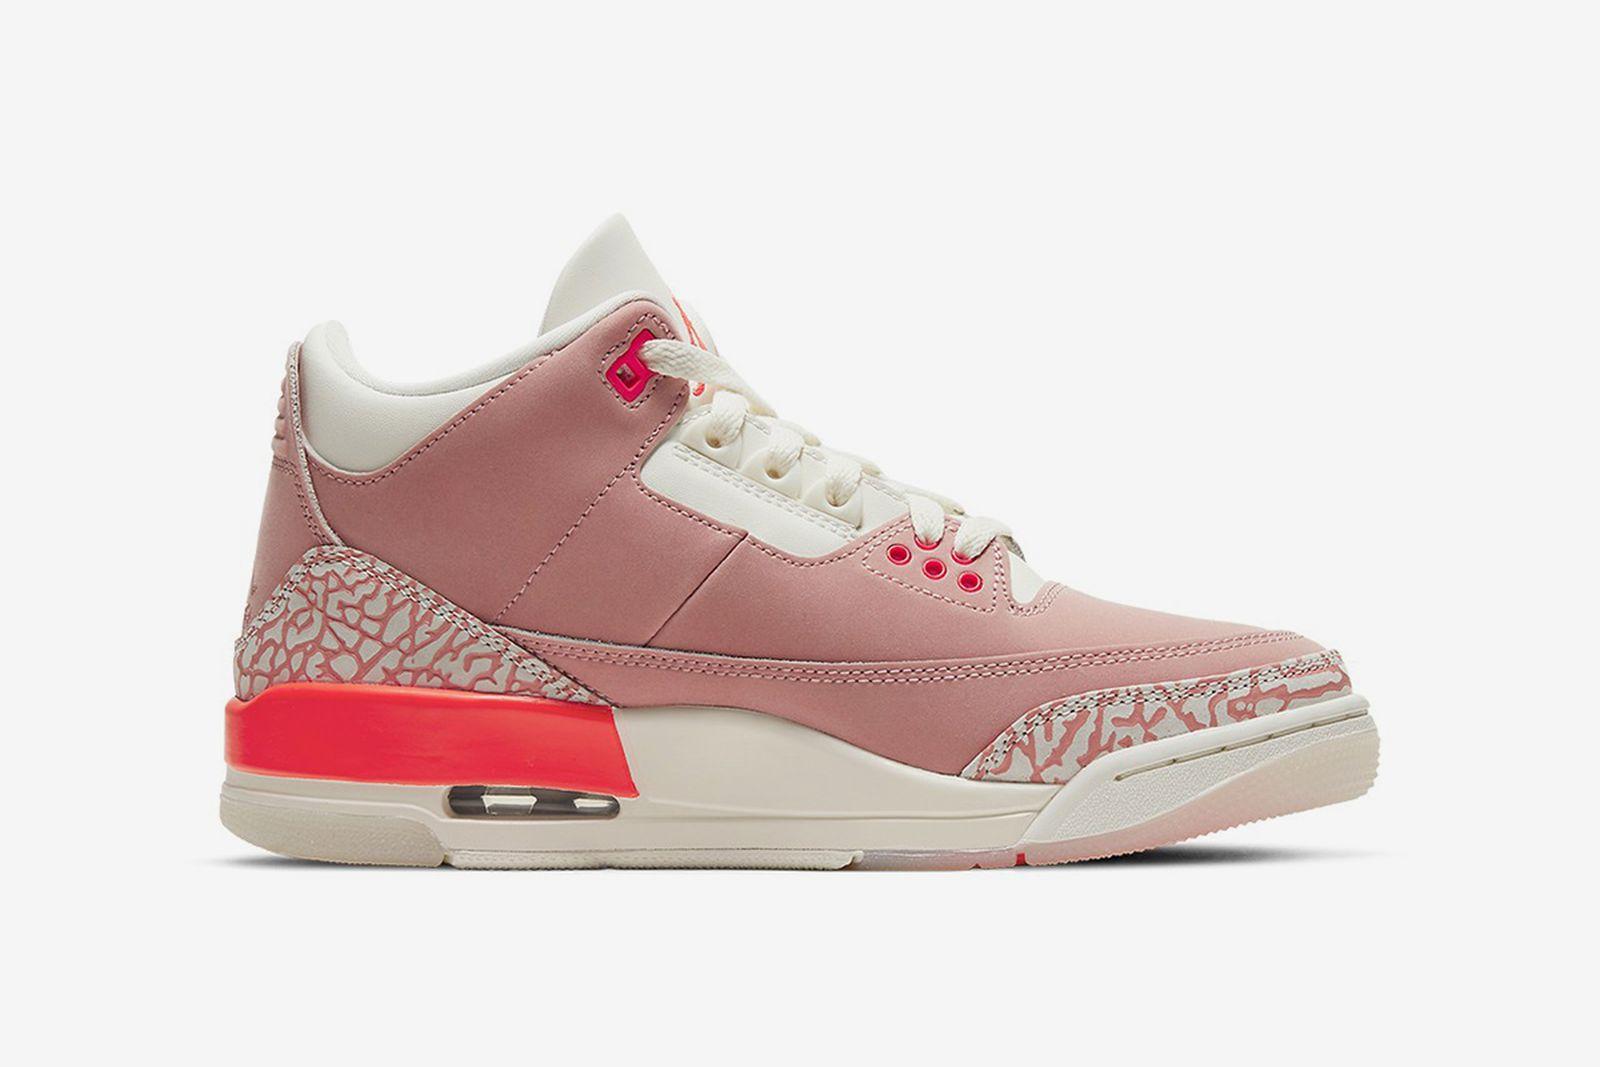 air-jordan-3-rust-pink-release-info-02